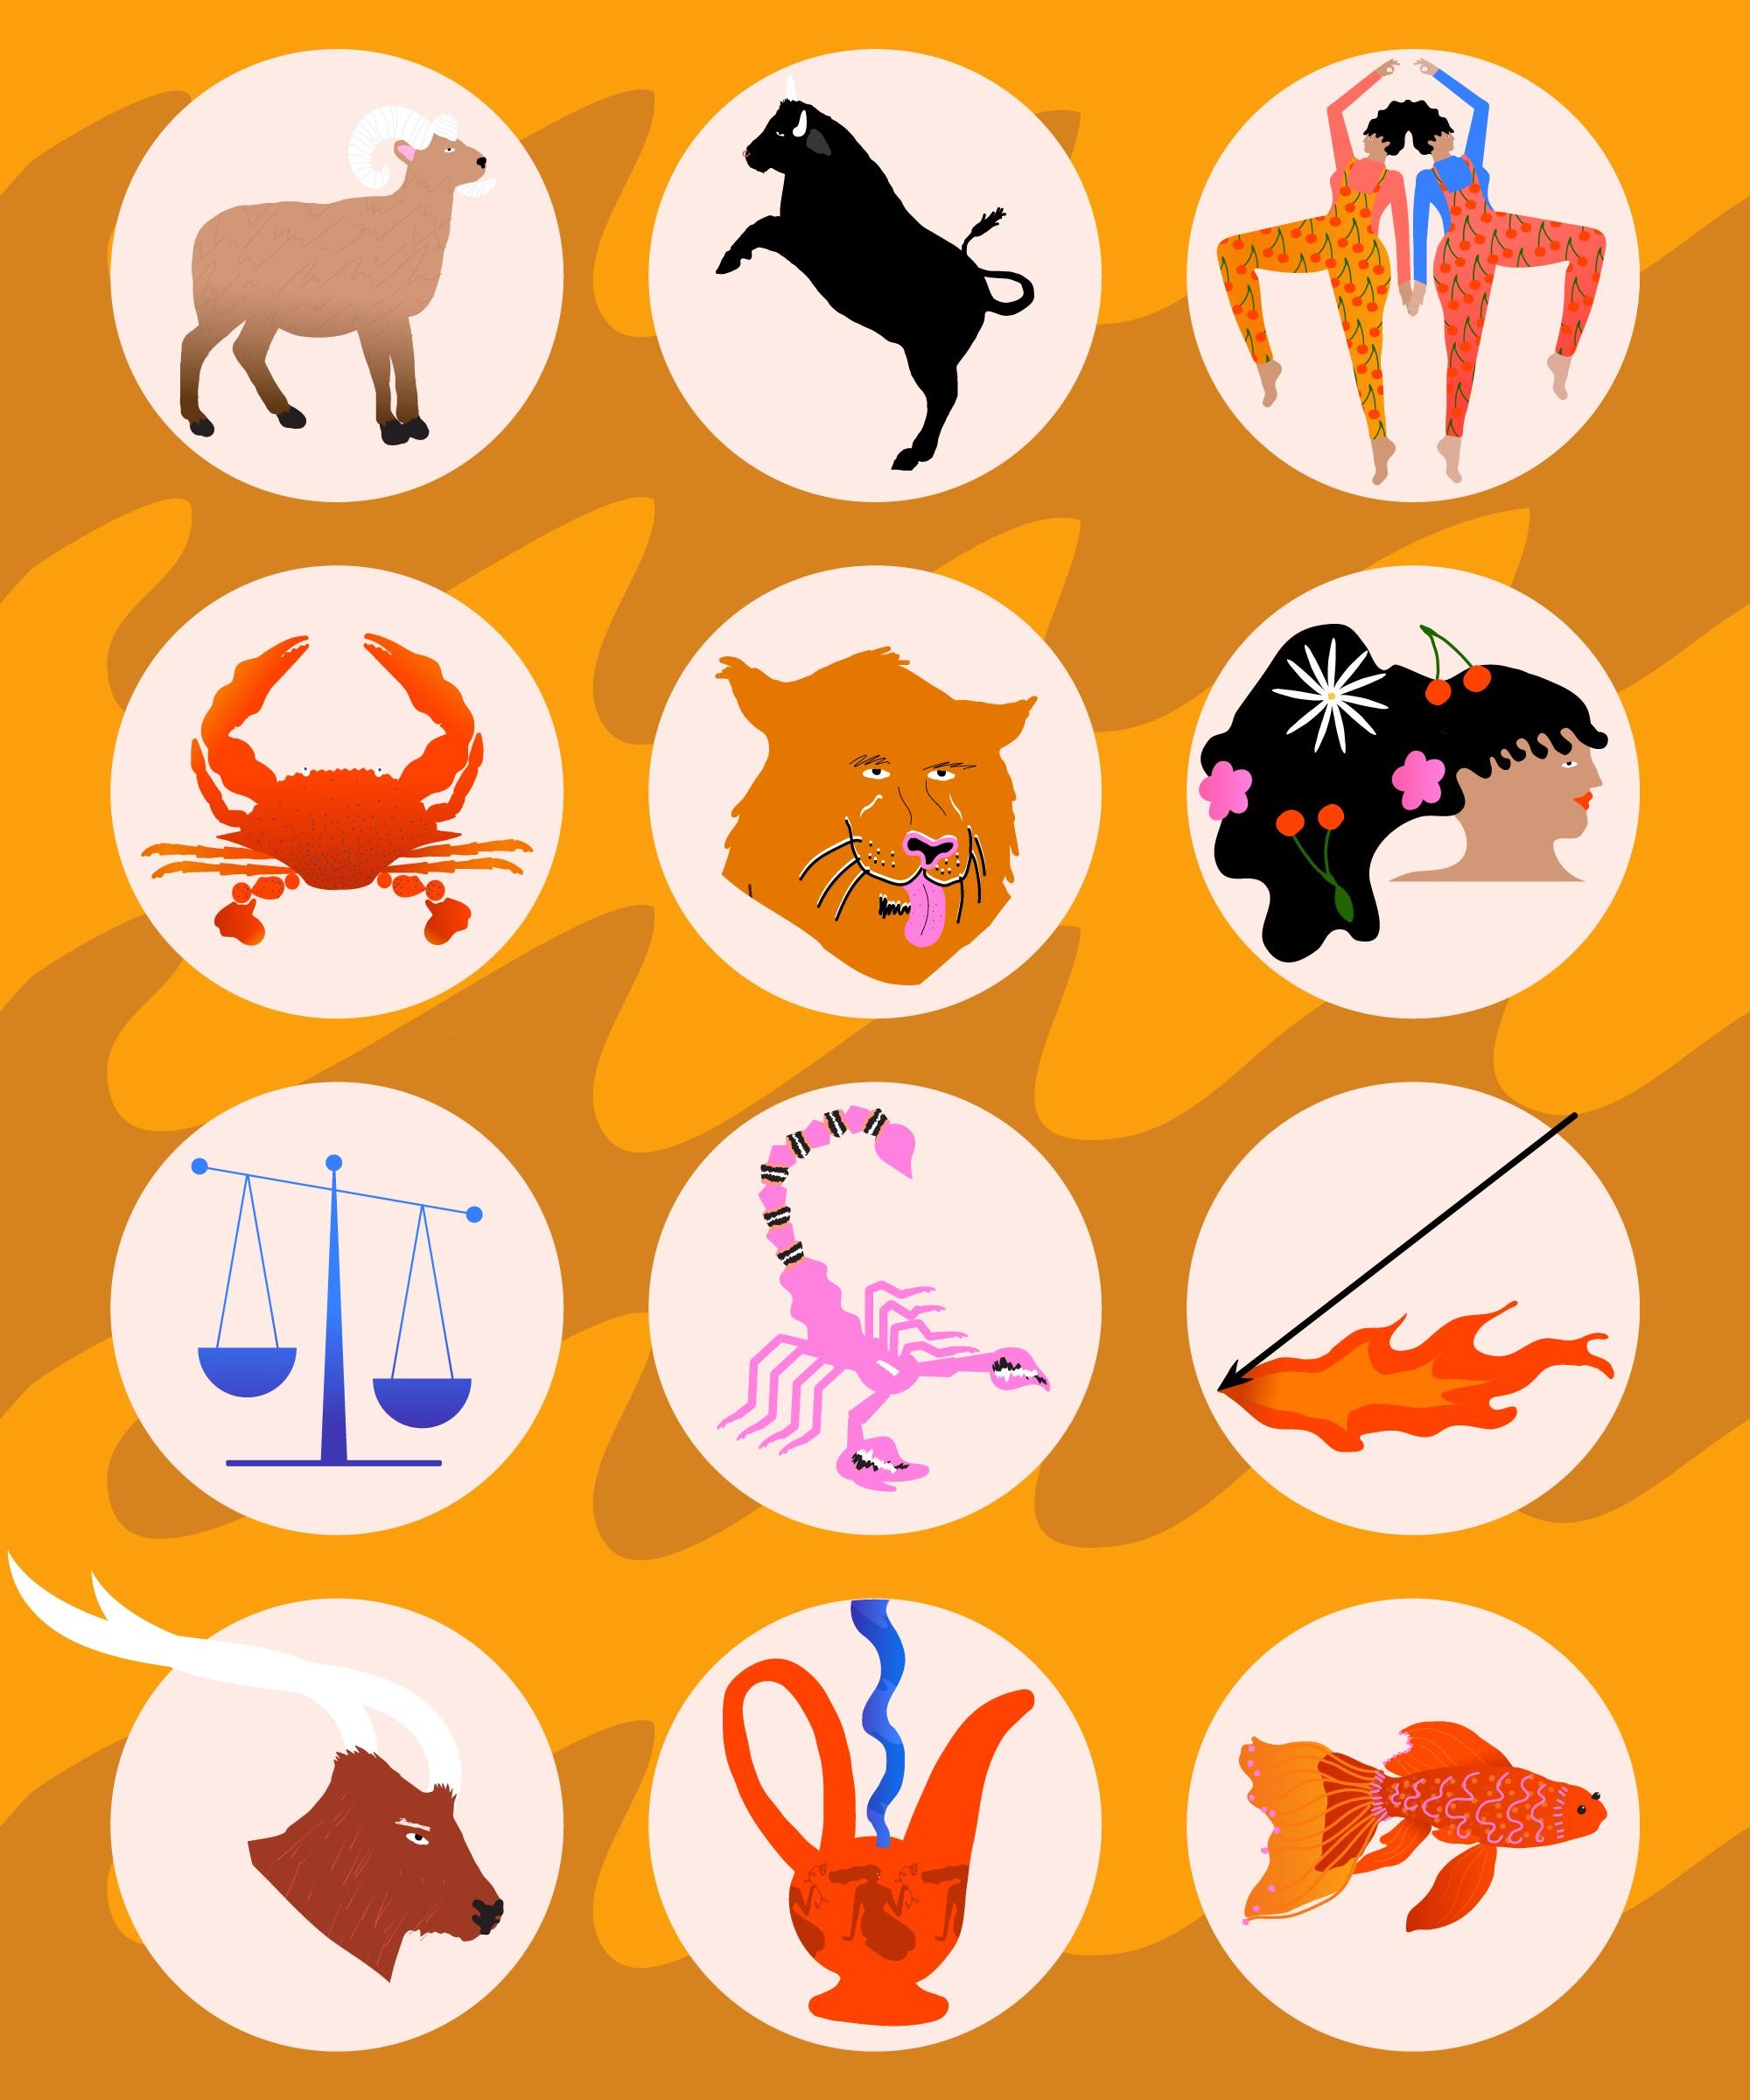 Your August Horoscope Revealed